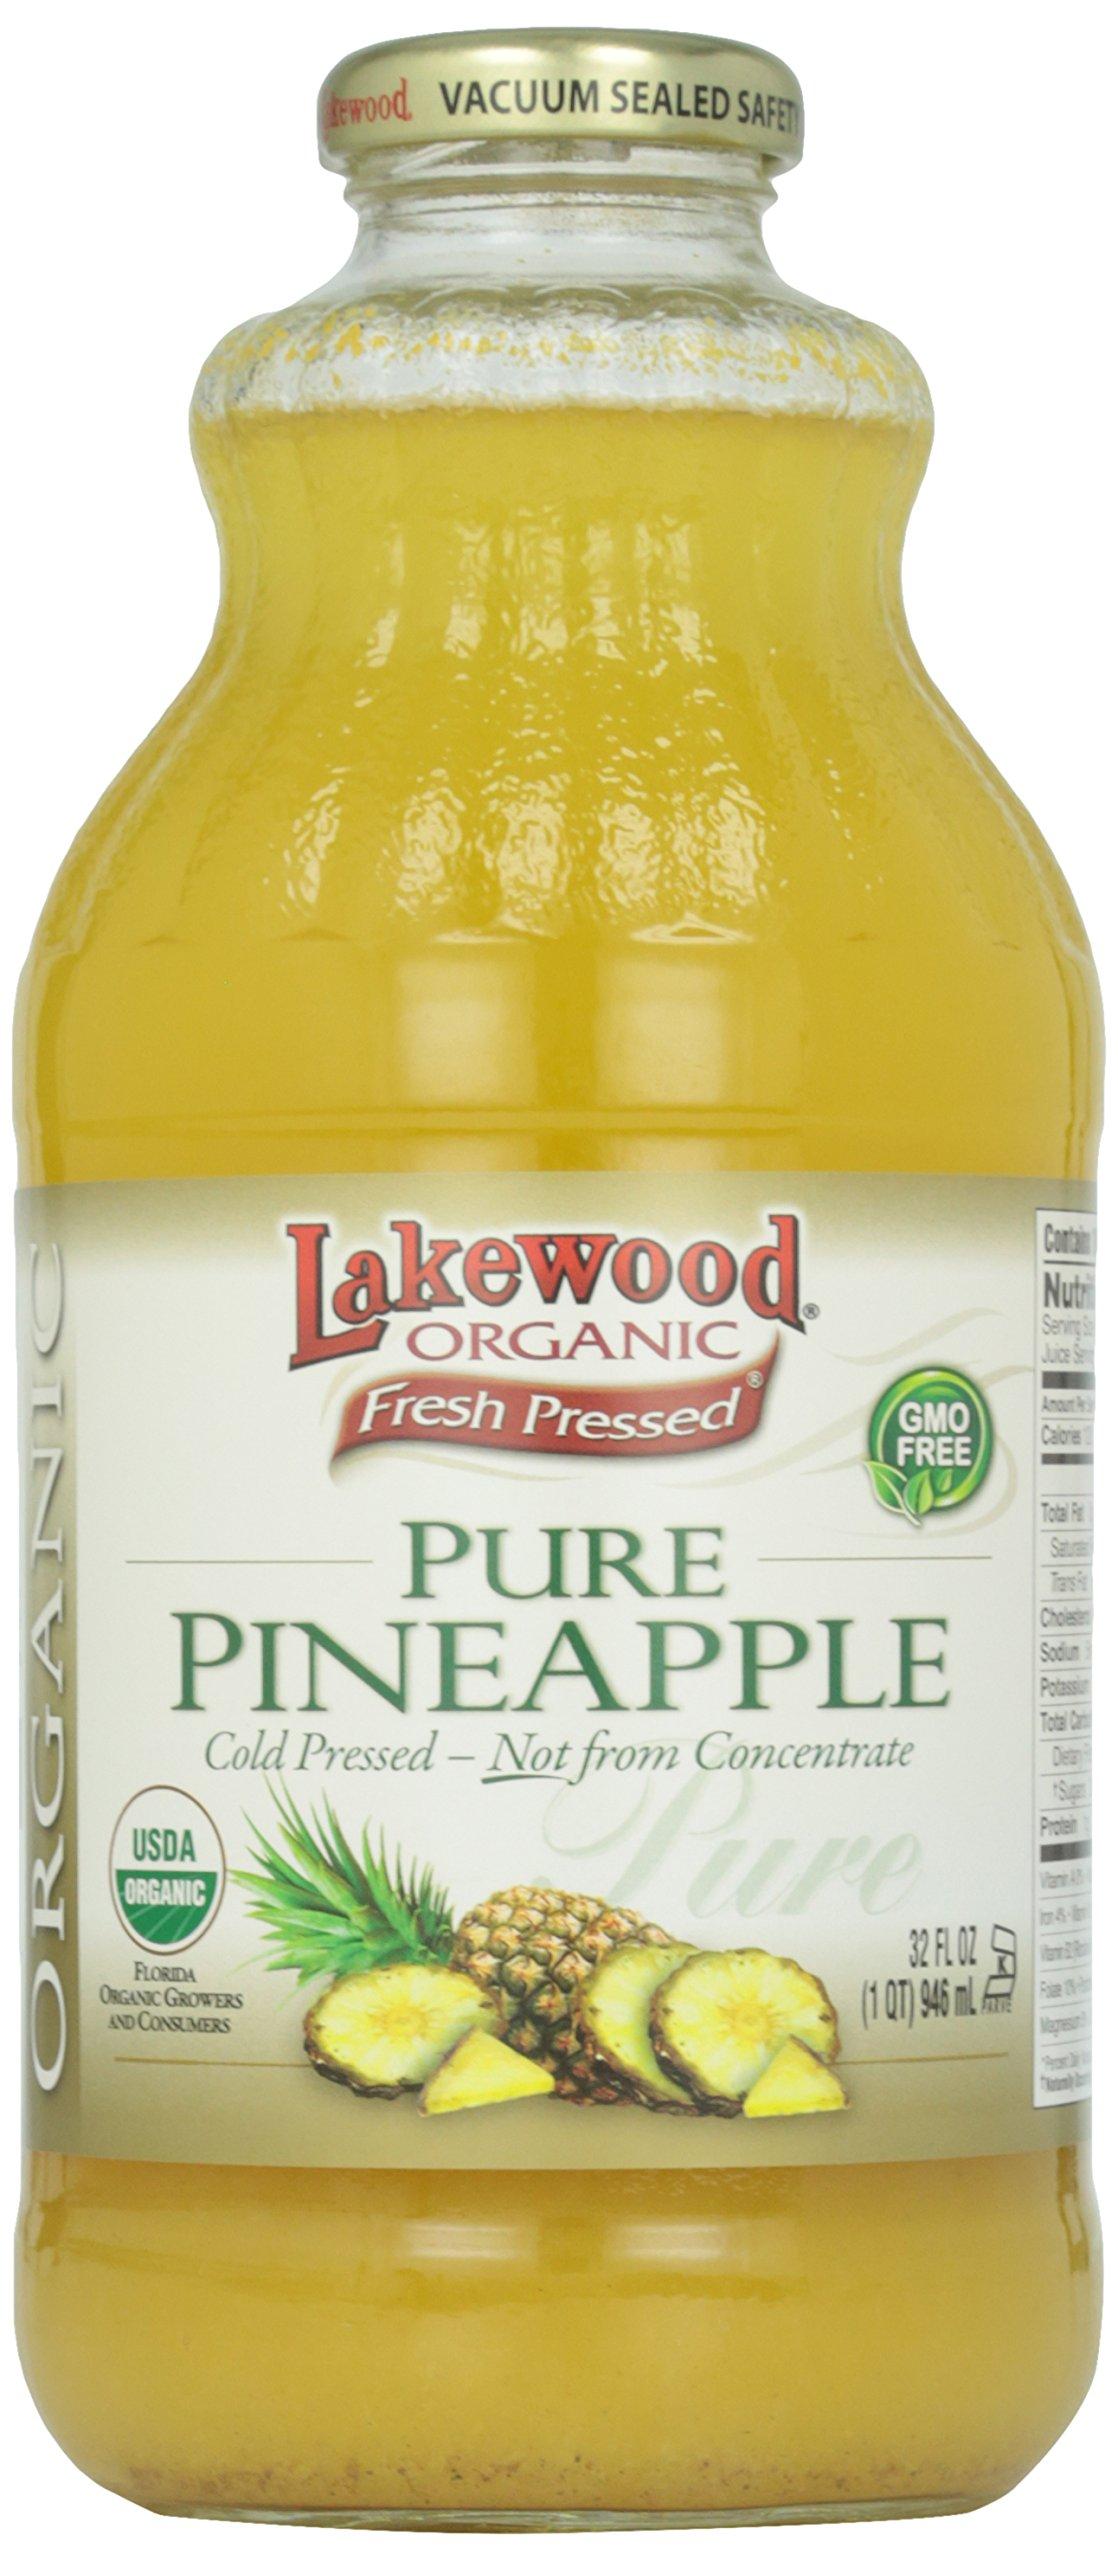 Lakewood Pure Pineapple Juice, Organic, 1 Quart